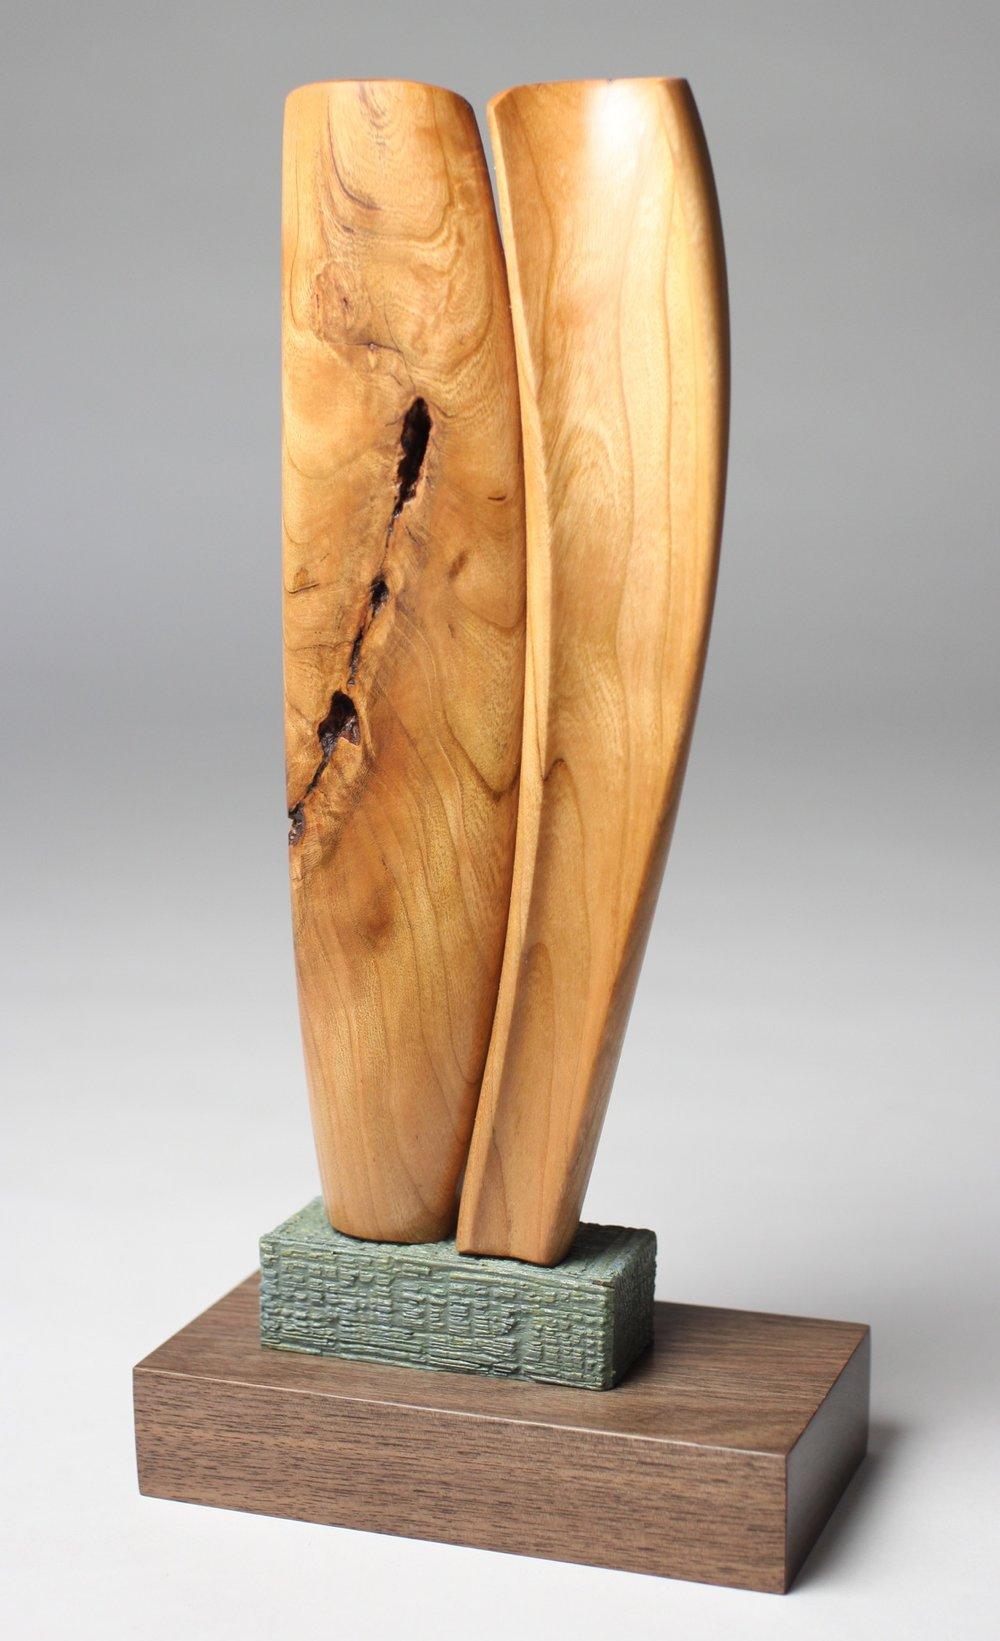 Sculpture #1 (view 2)